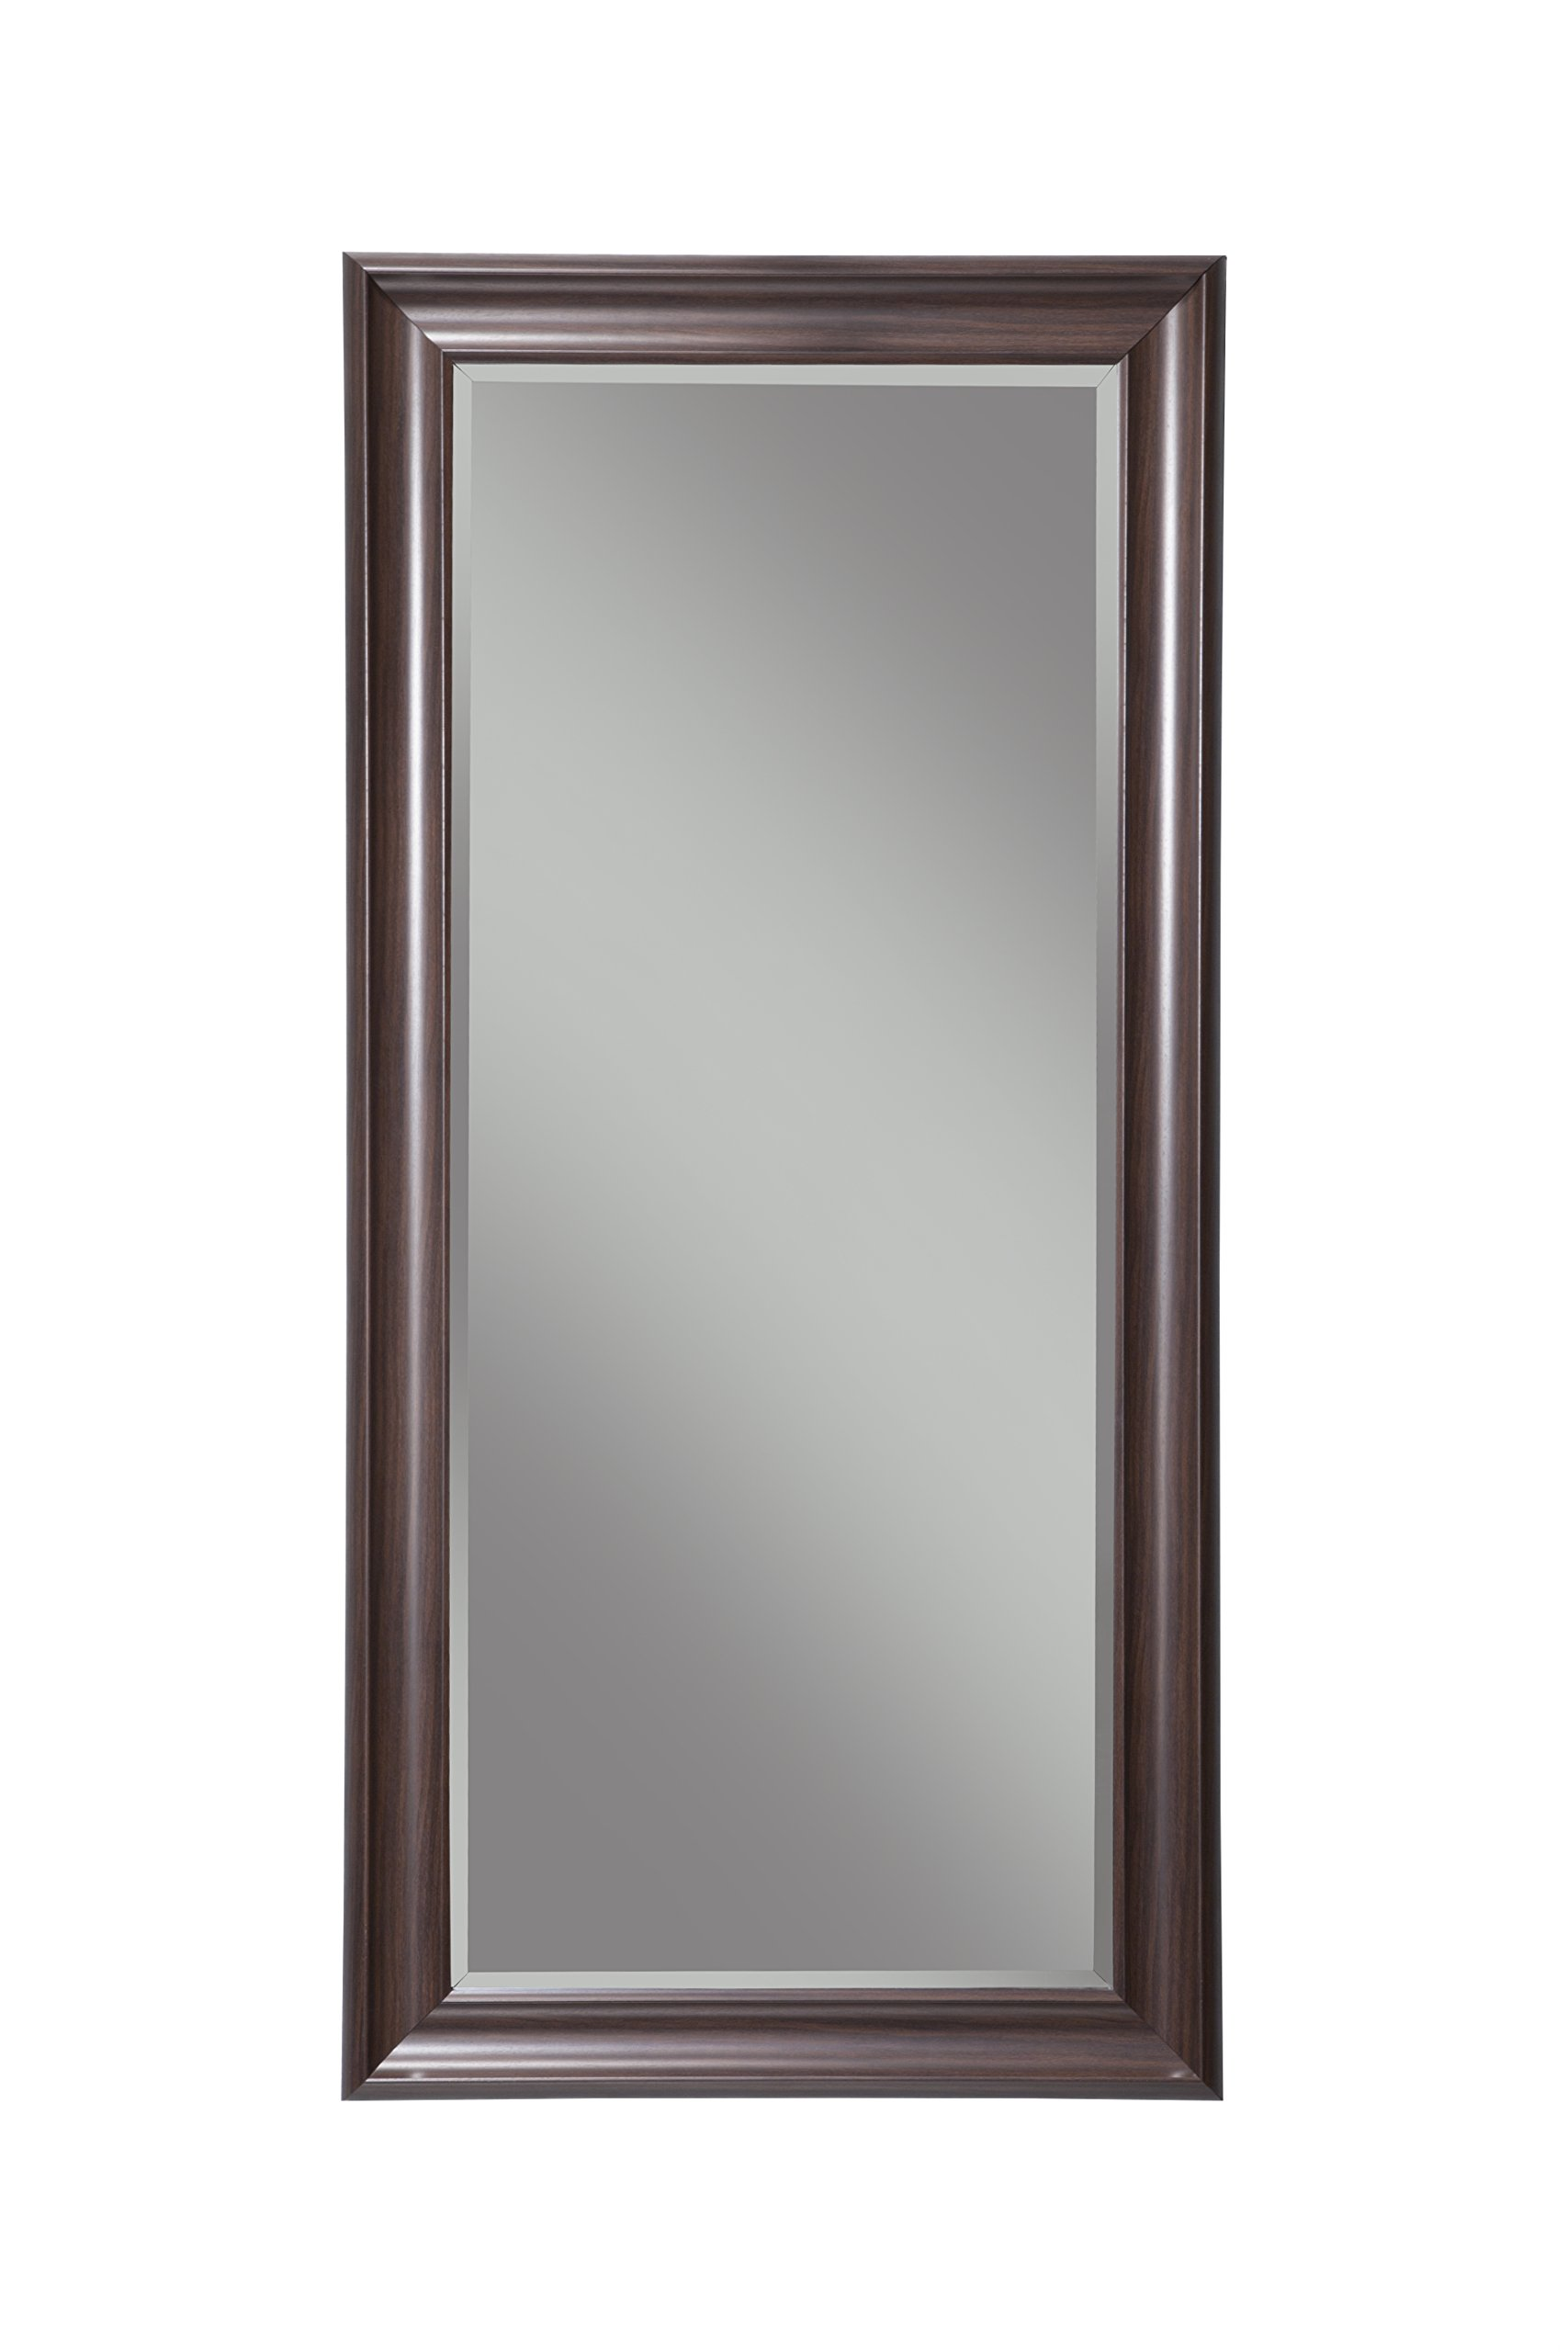 Sandberg Furniture, Full Length Leaner Mirror, Espresso by Sandberg Furniture